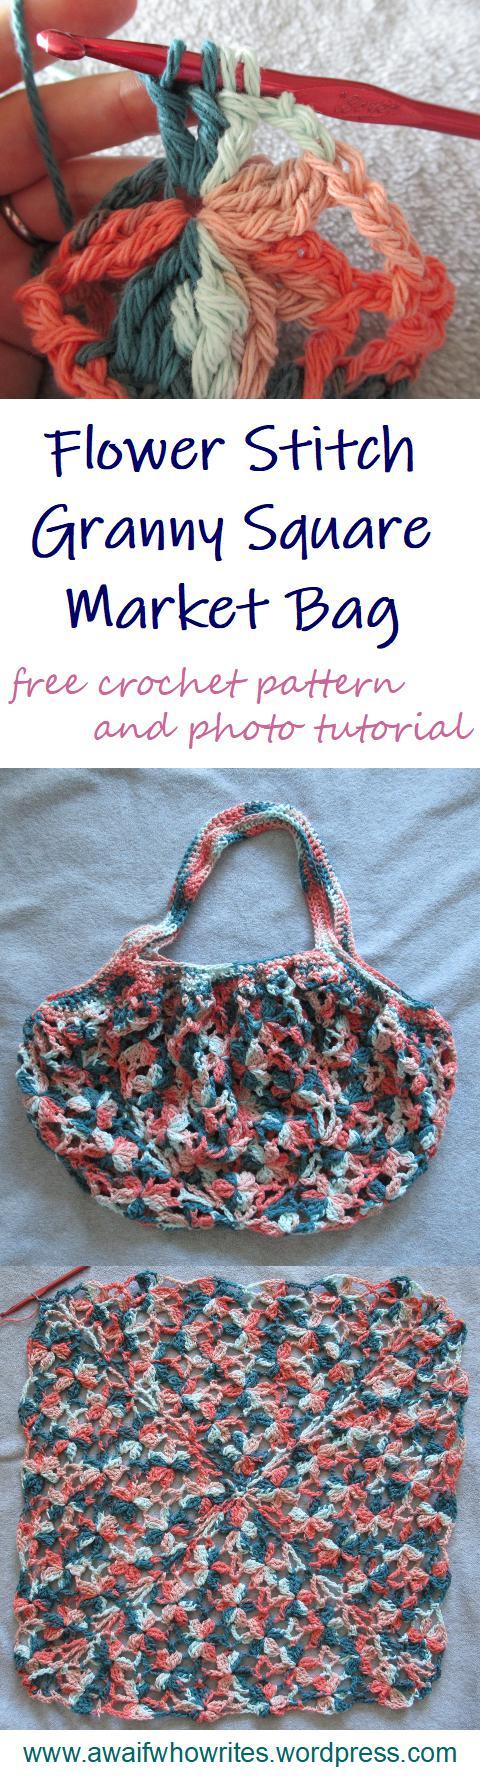 Flower Stitch Granny Square Market Bag | free crochet pattern and photo tutorial